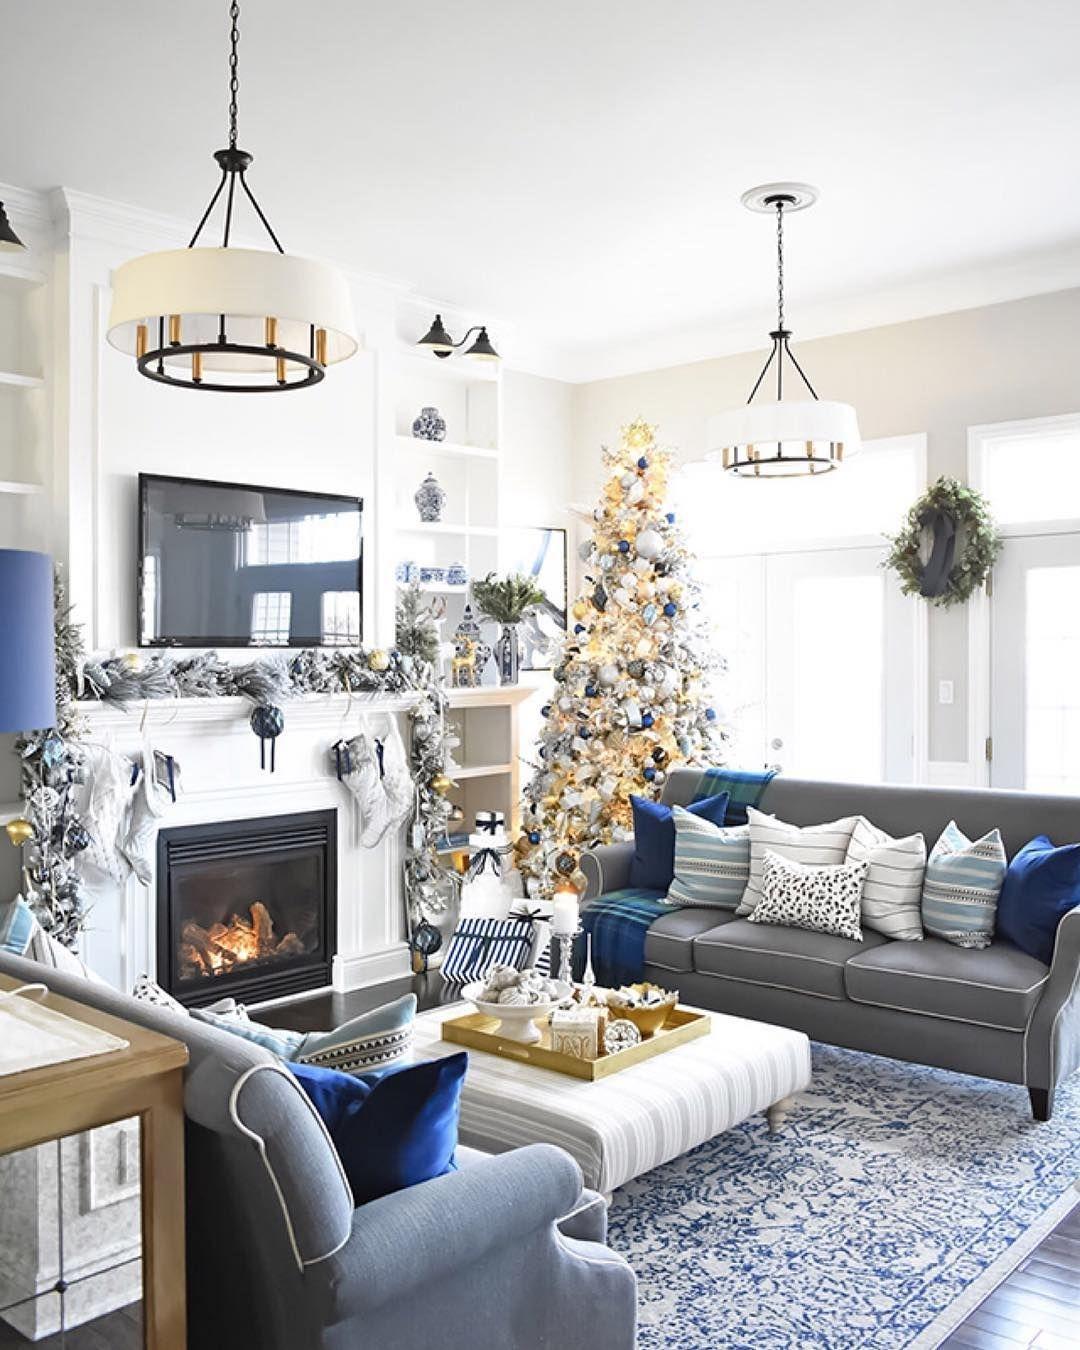 Lovely Farmhouse Christmas Porch Decor And Design Ideas 23